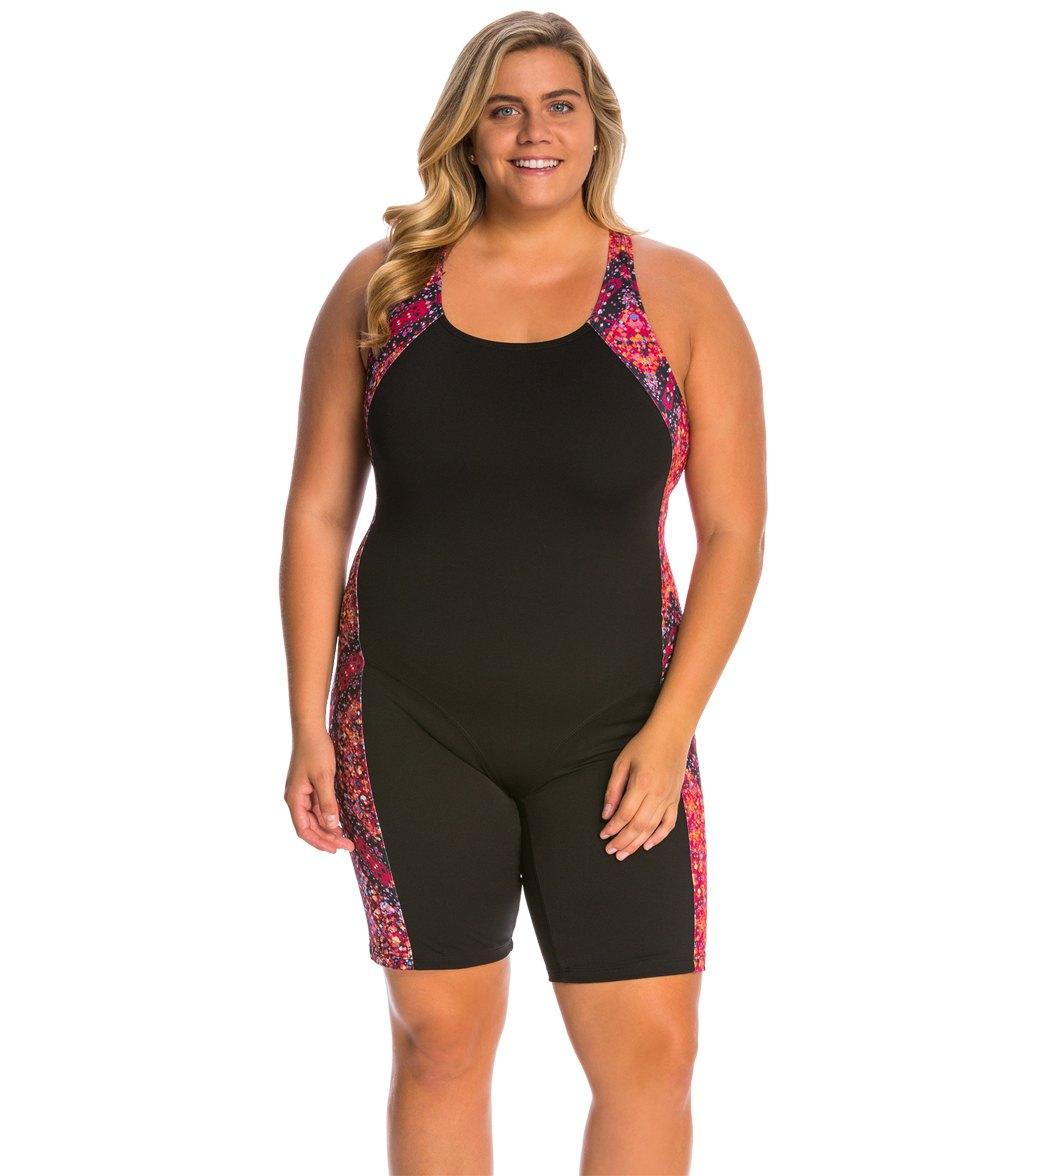 62a9f514157 EQ Swimwear Plus Size Glide Unitard Swimsuit at SwimOutlet.com - Free  Shipping